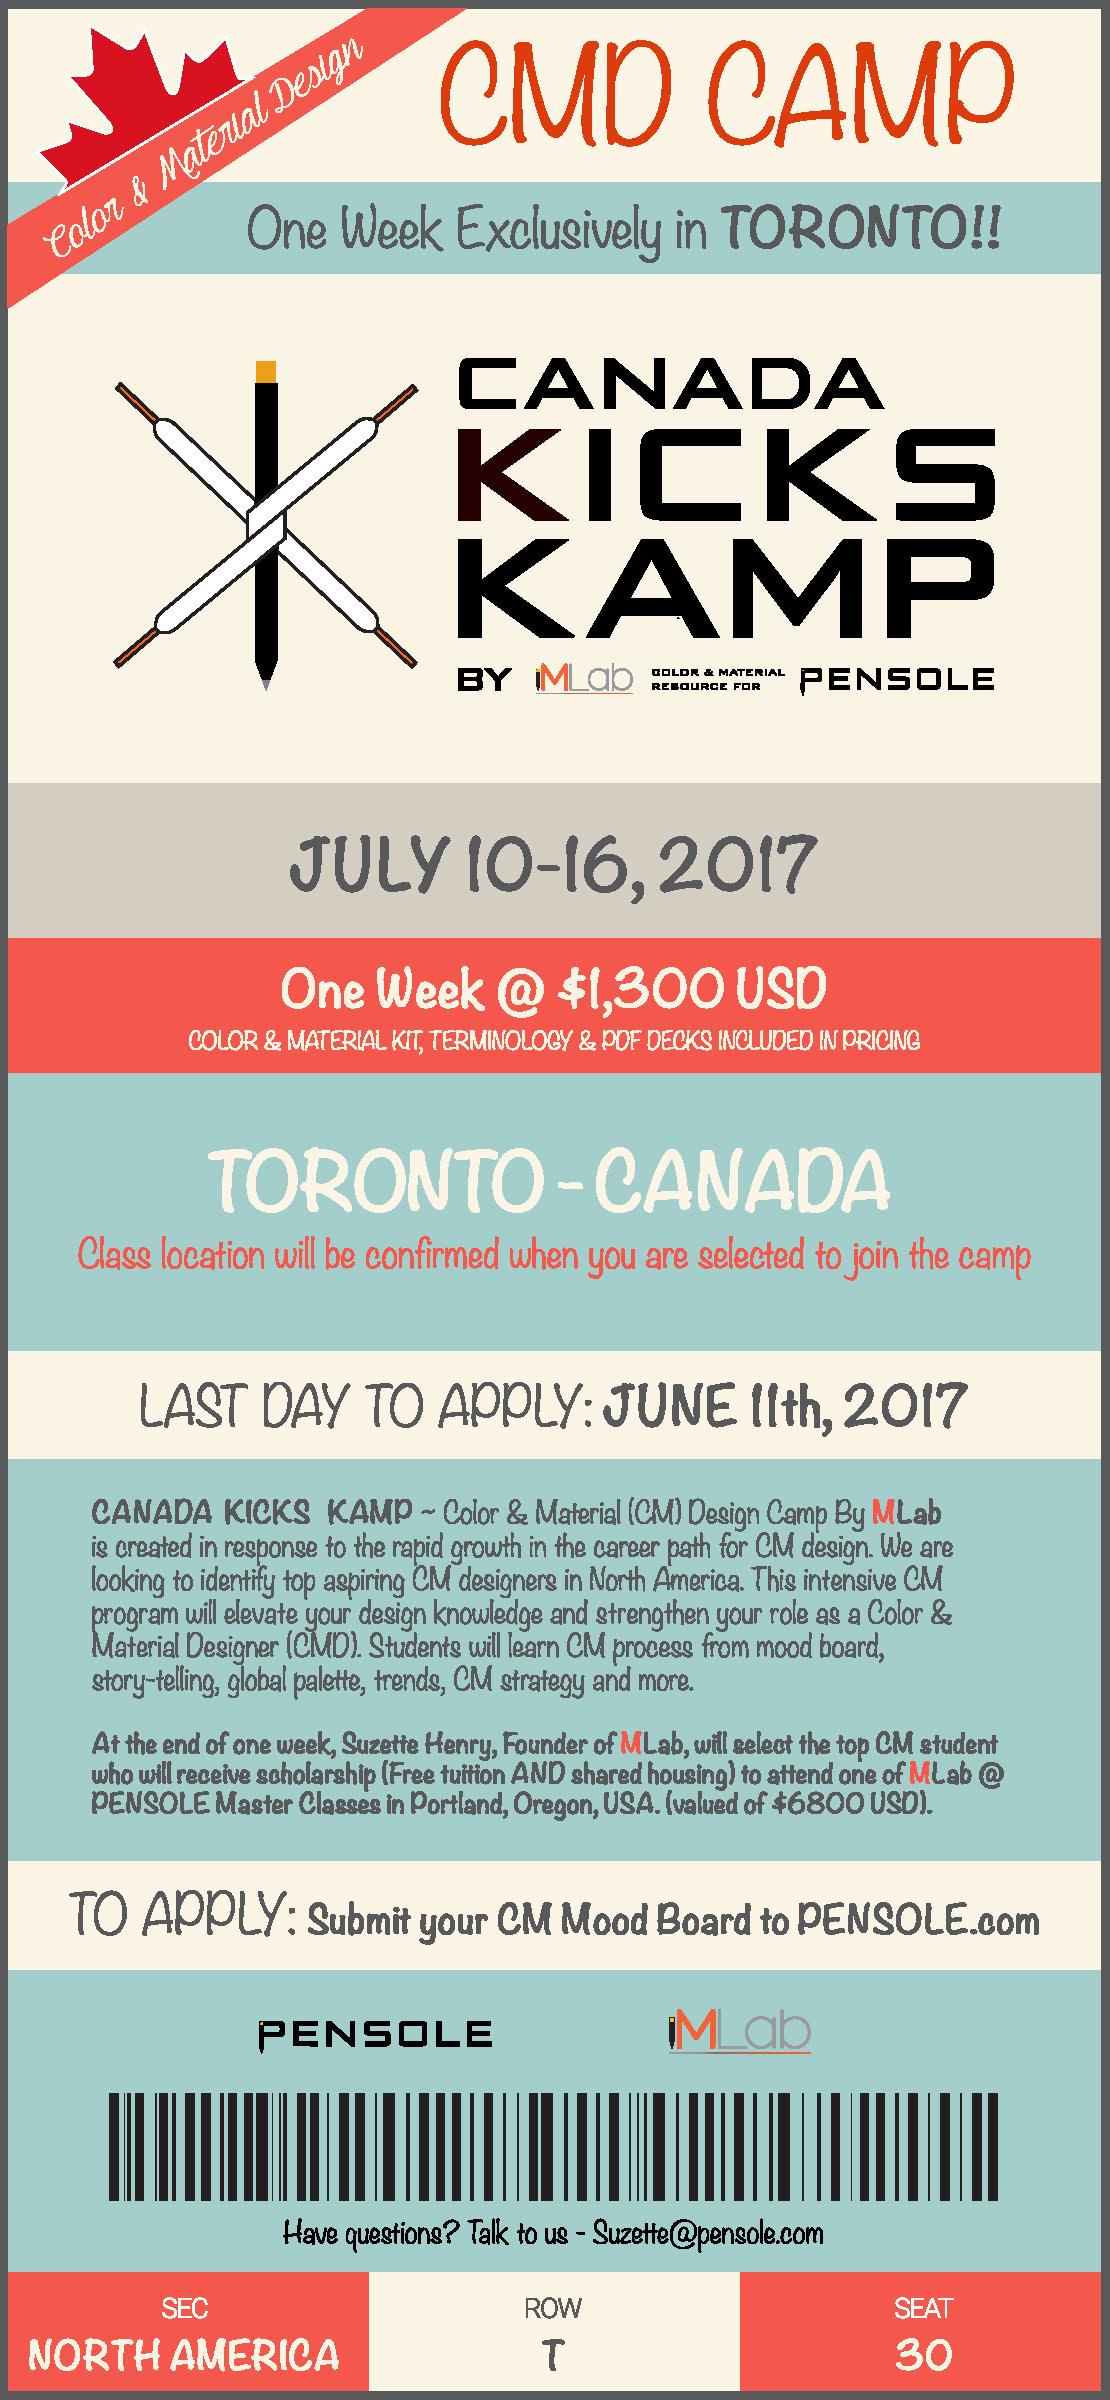 CMD Canada Kicks Kamp Poster_email1.jpg